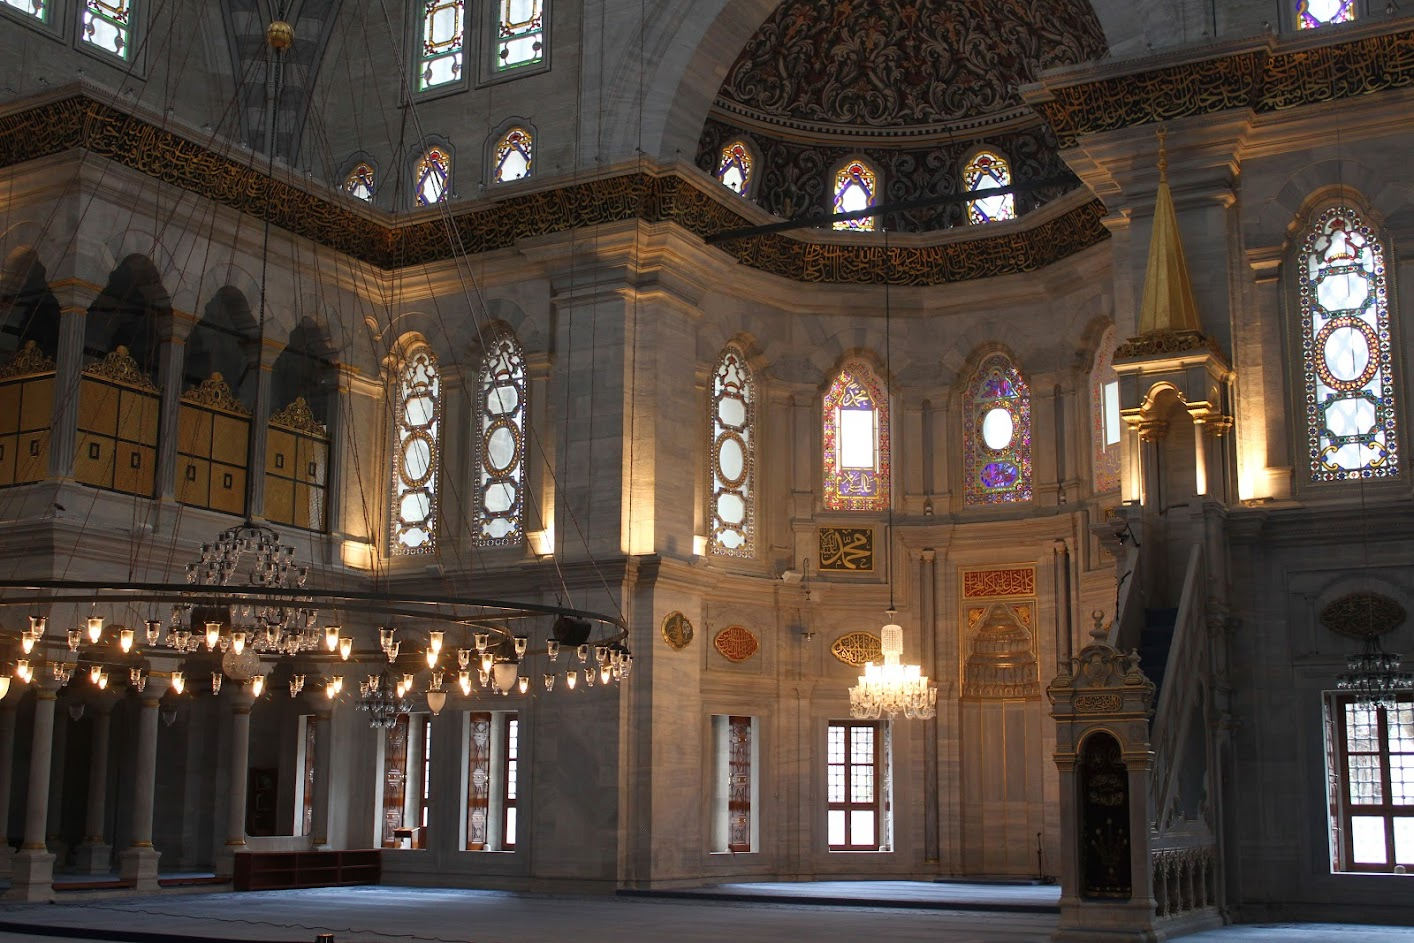 Roteiro ISTAMBUL - 2º dia em Istambul - Bairro do Bazar | Turquia